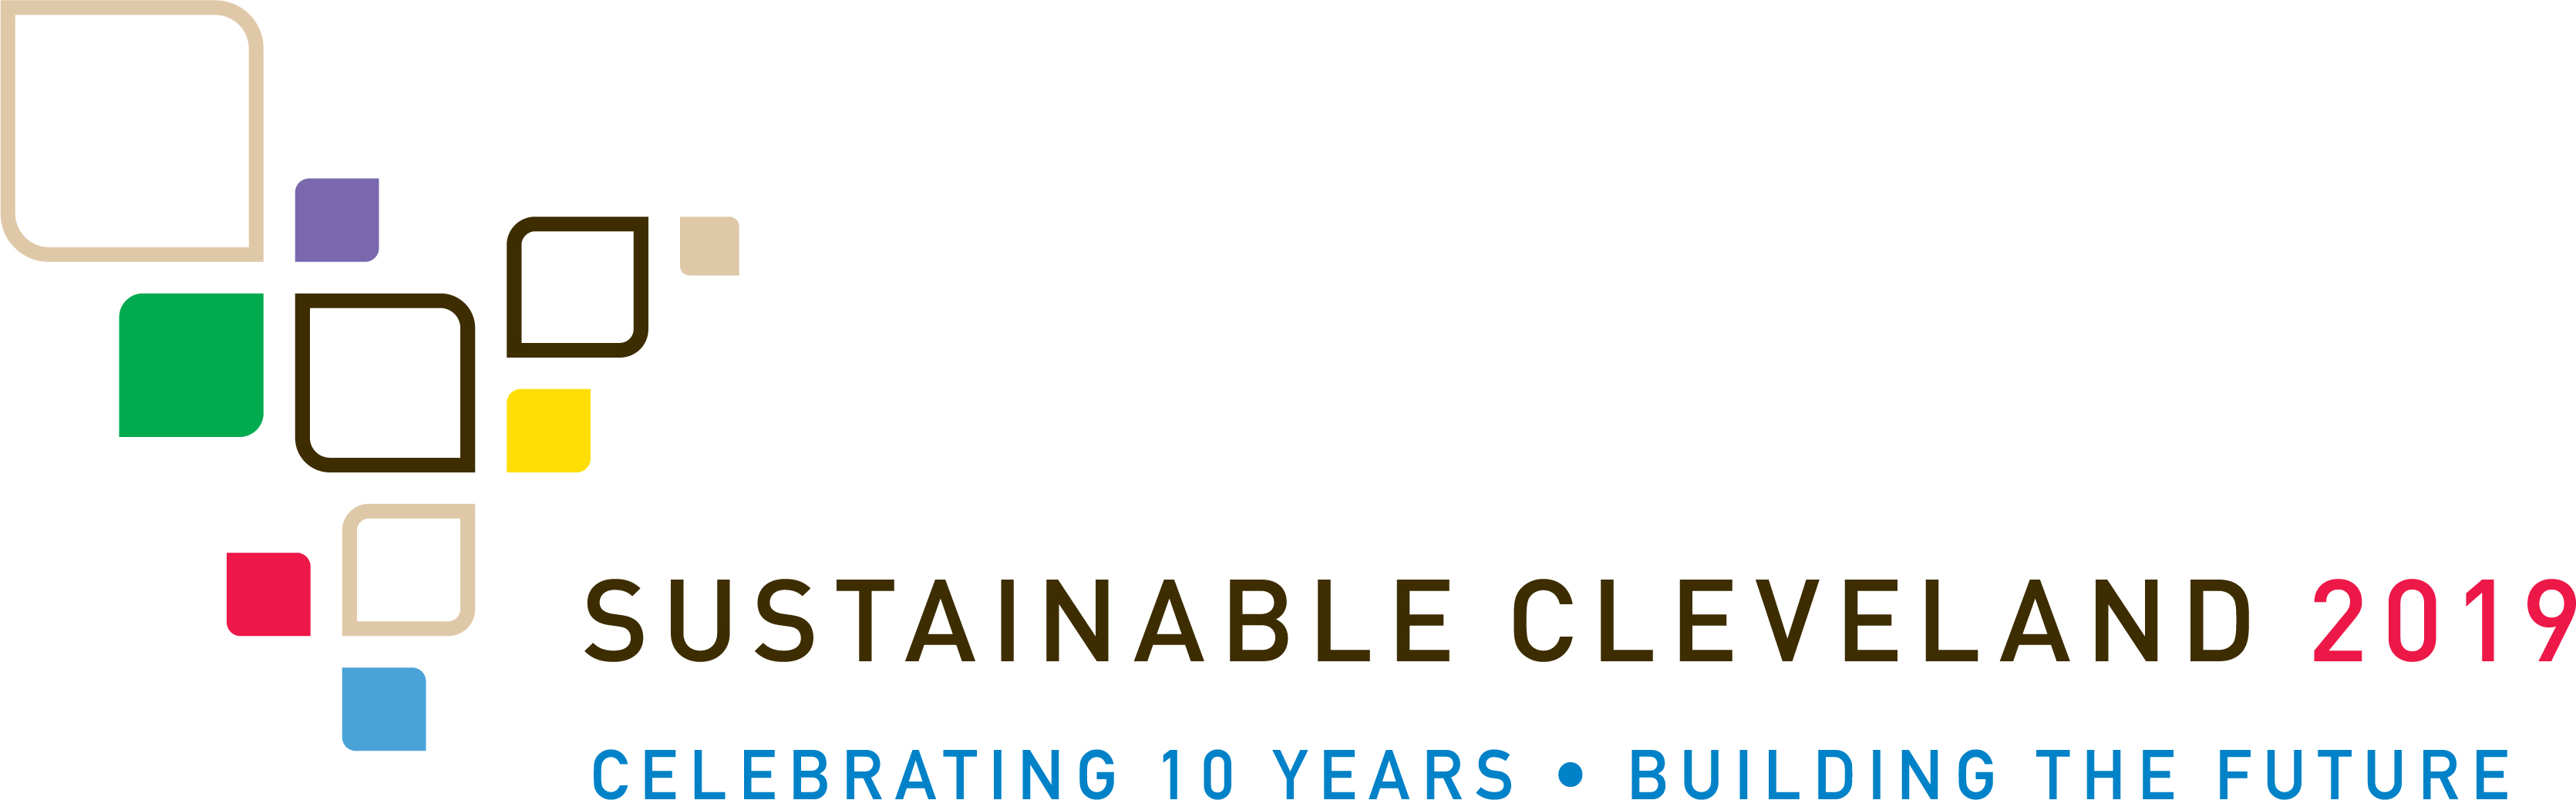 SUSTAINABLE_CLE_Logo_PrimaryBuildFuture.jpg